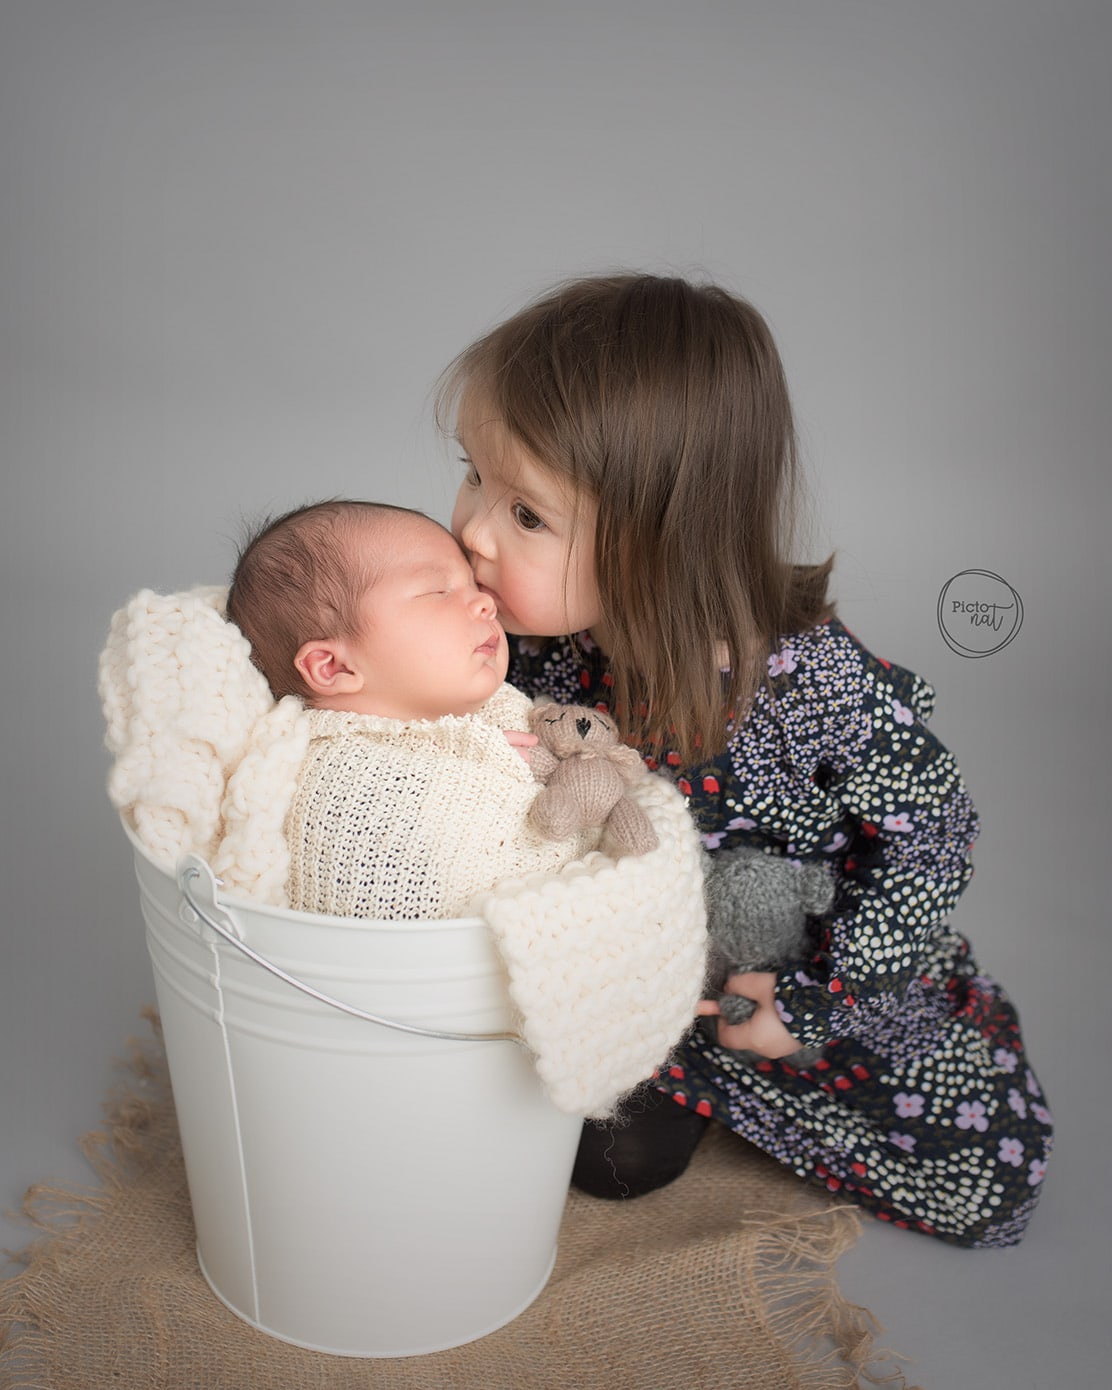 Toronto Newborn Photographer - Pictonat Photography